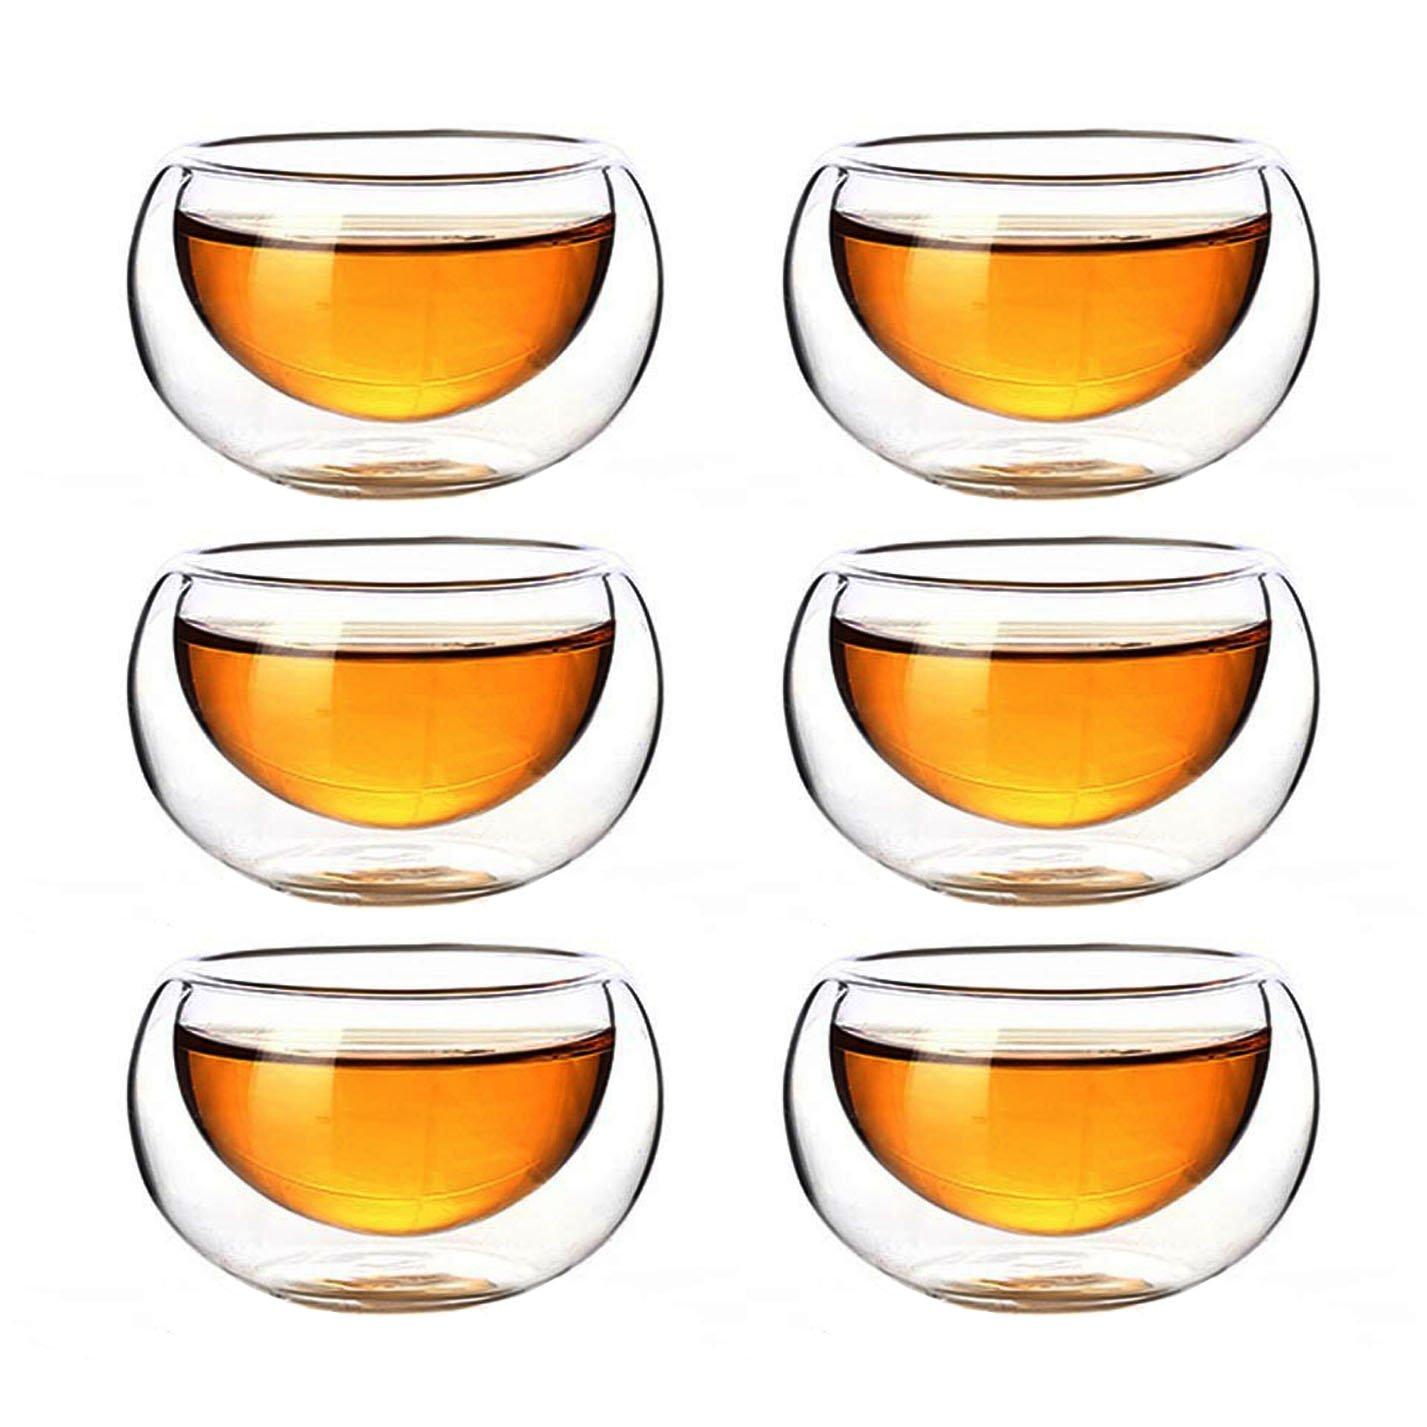 Teapot Tea For One Duo Teapot And Teacup Lavender Violets 15 Oz Total Burton and Burton BURTON-086384